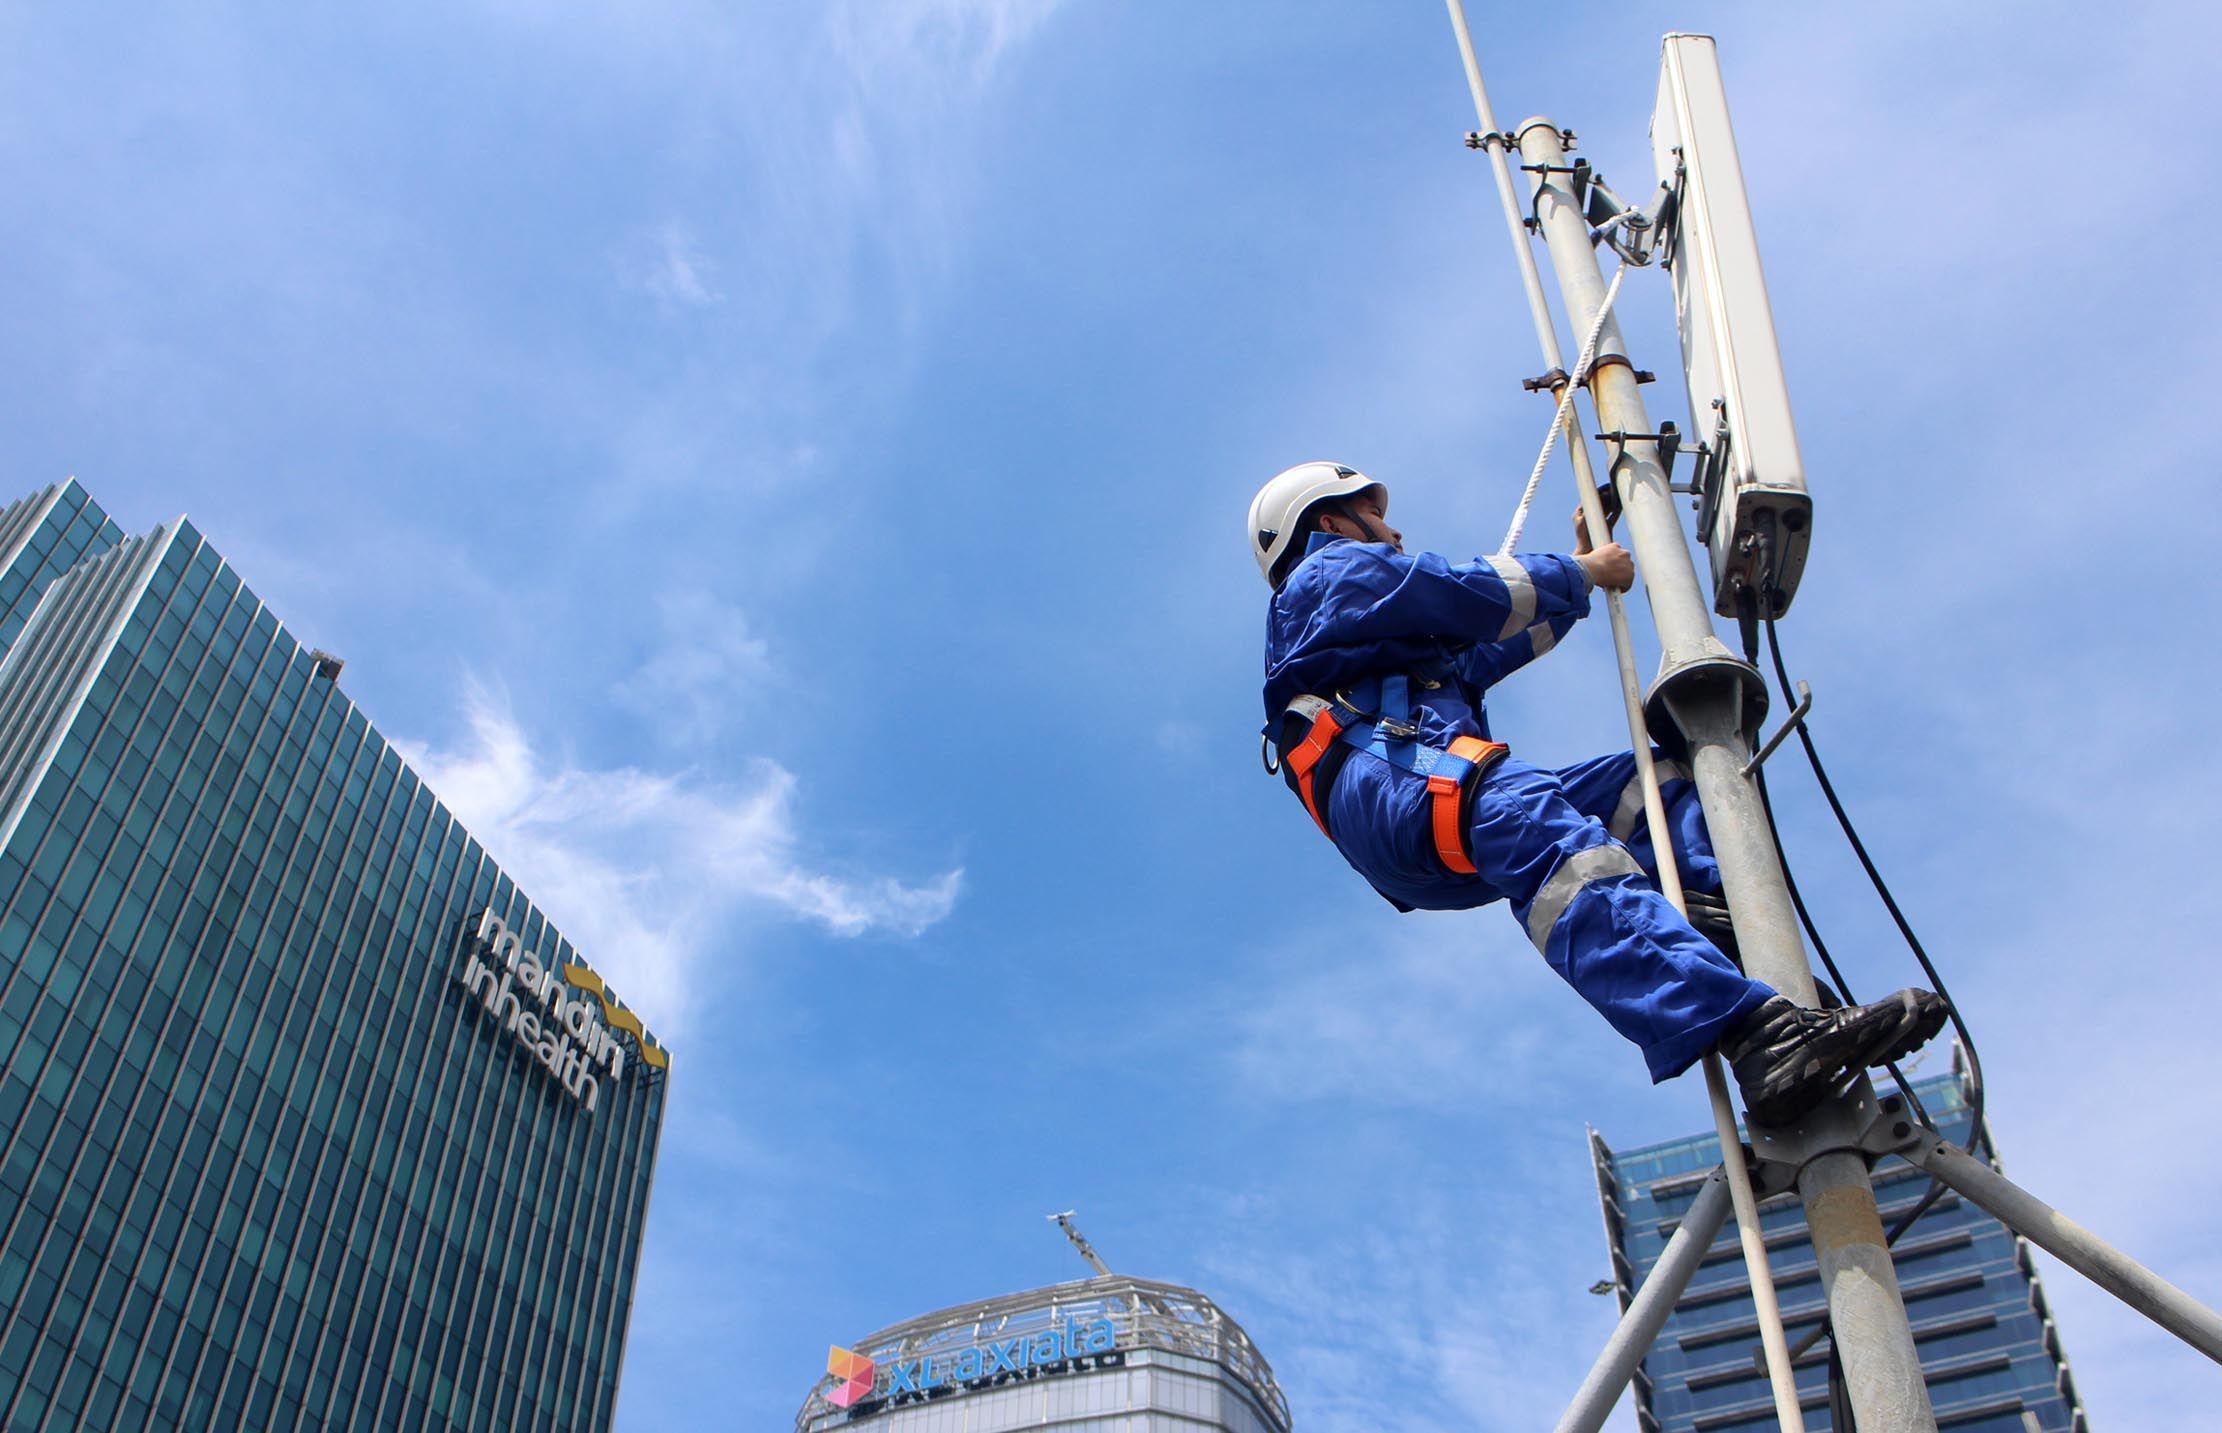 Crossing Saham CENT, Siapa Borong Centratama Telekomunikasi Rp2,04 Triliun?